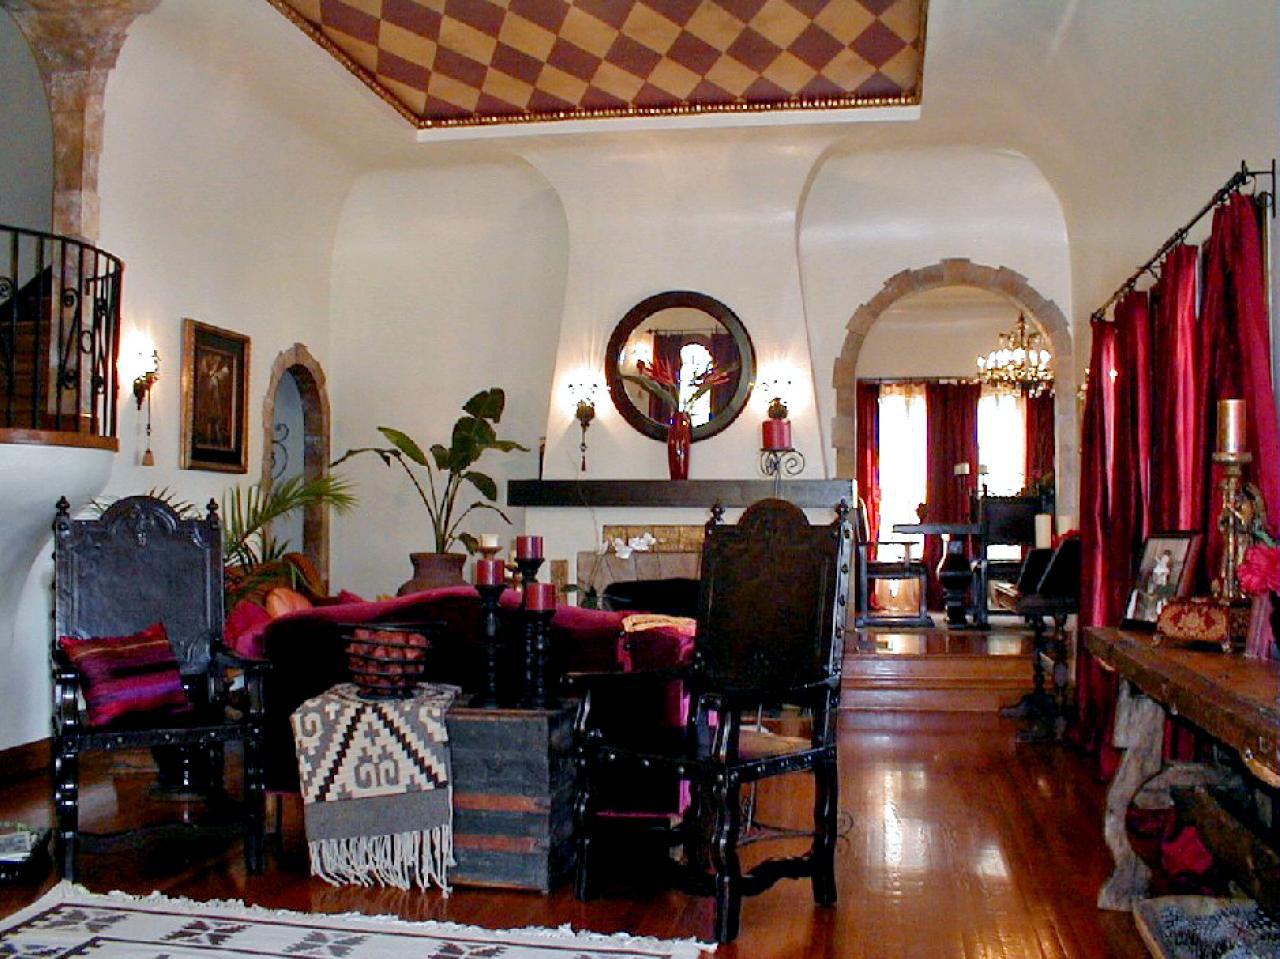 Southwestern-Interior-Design-Style-and-Decoration-Ideas-14 Southwestern Interior Design, Style and Decoration-Ideas